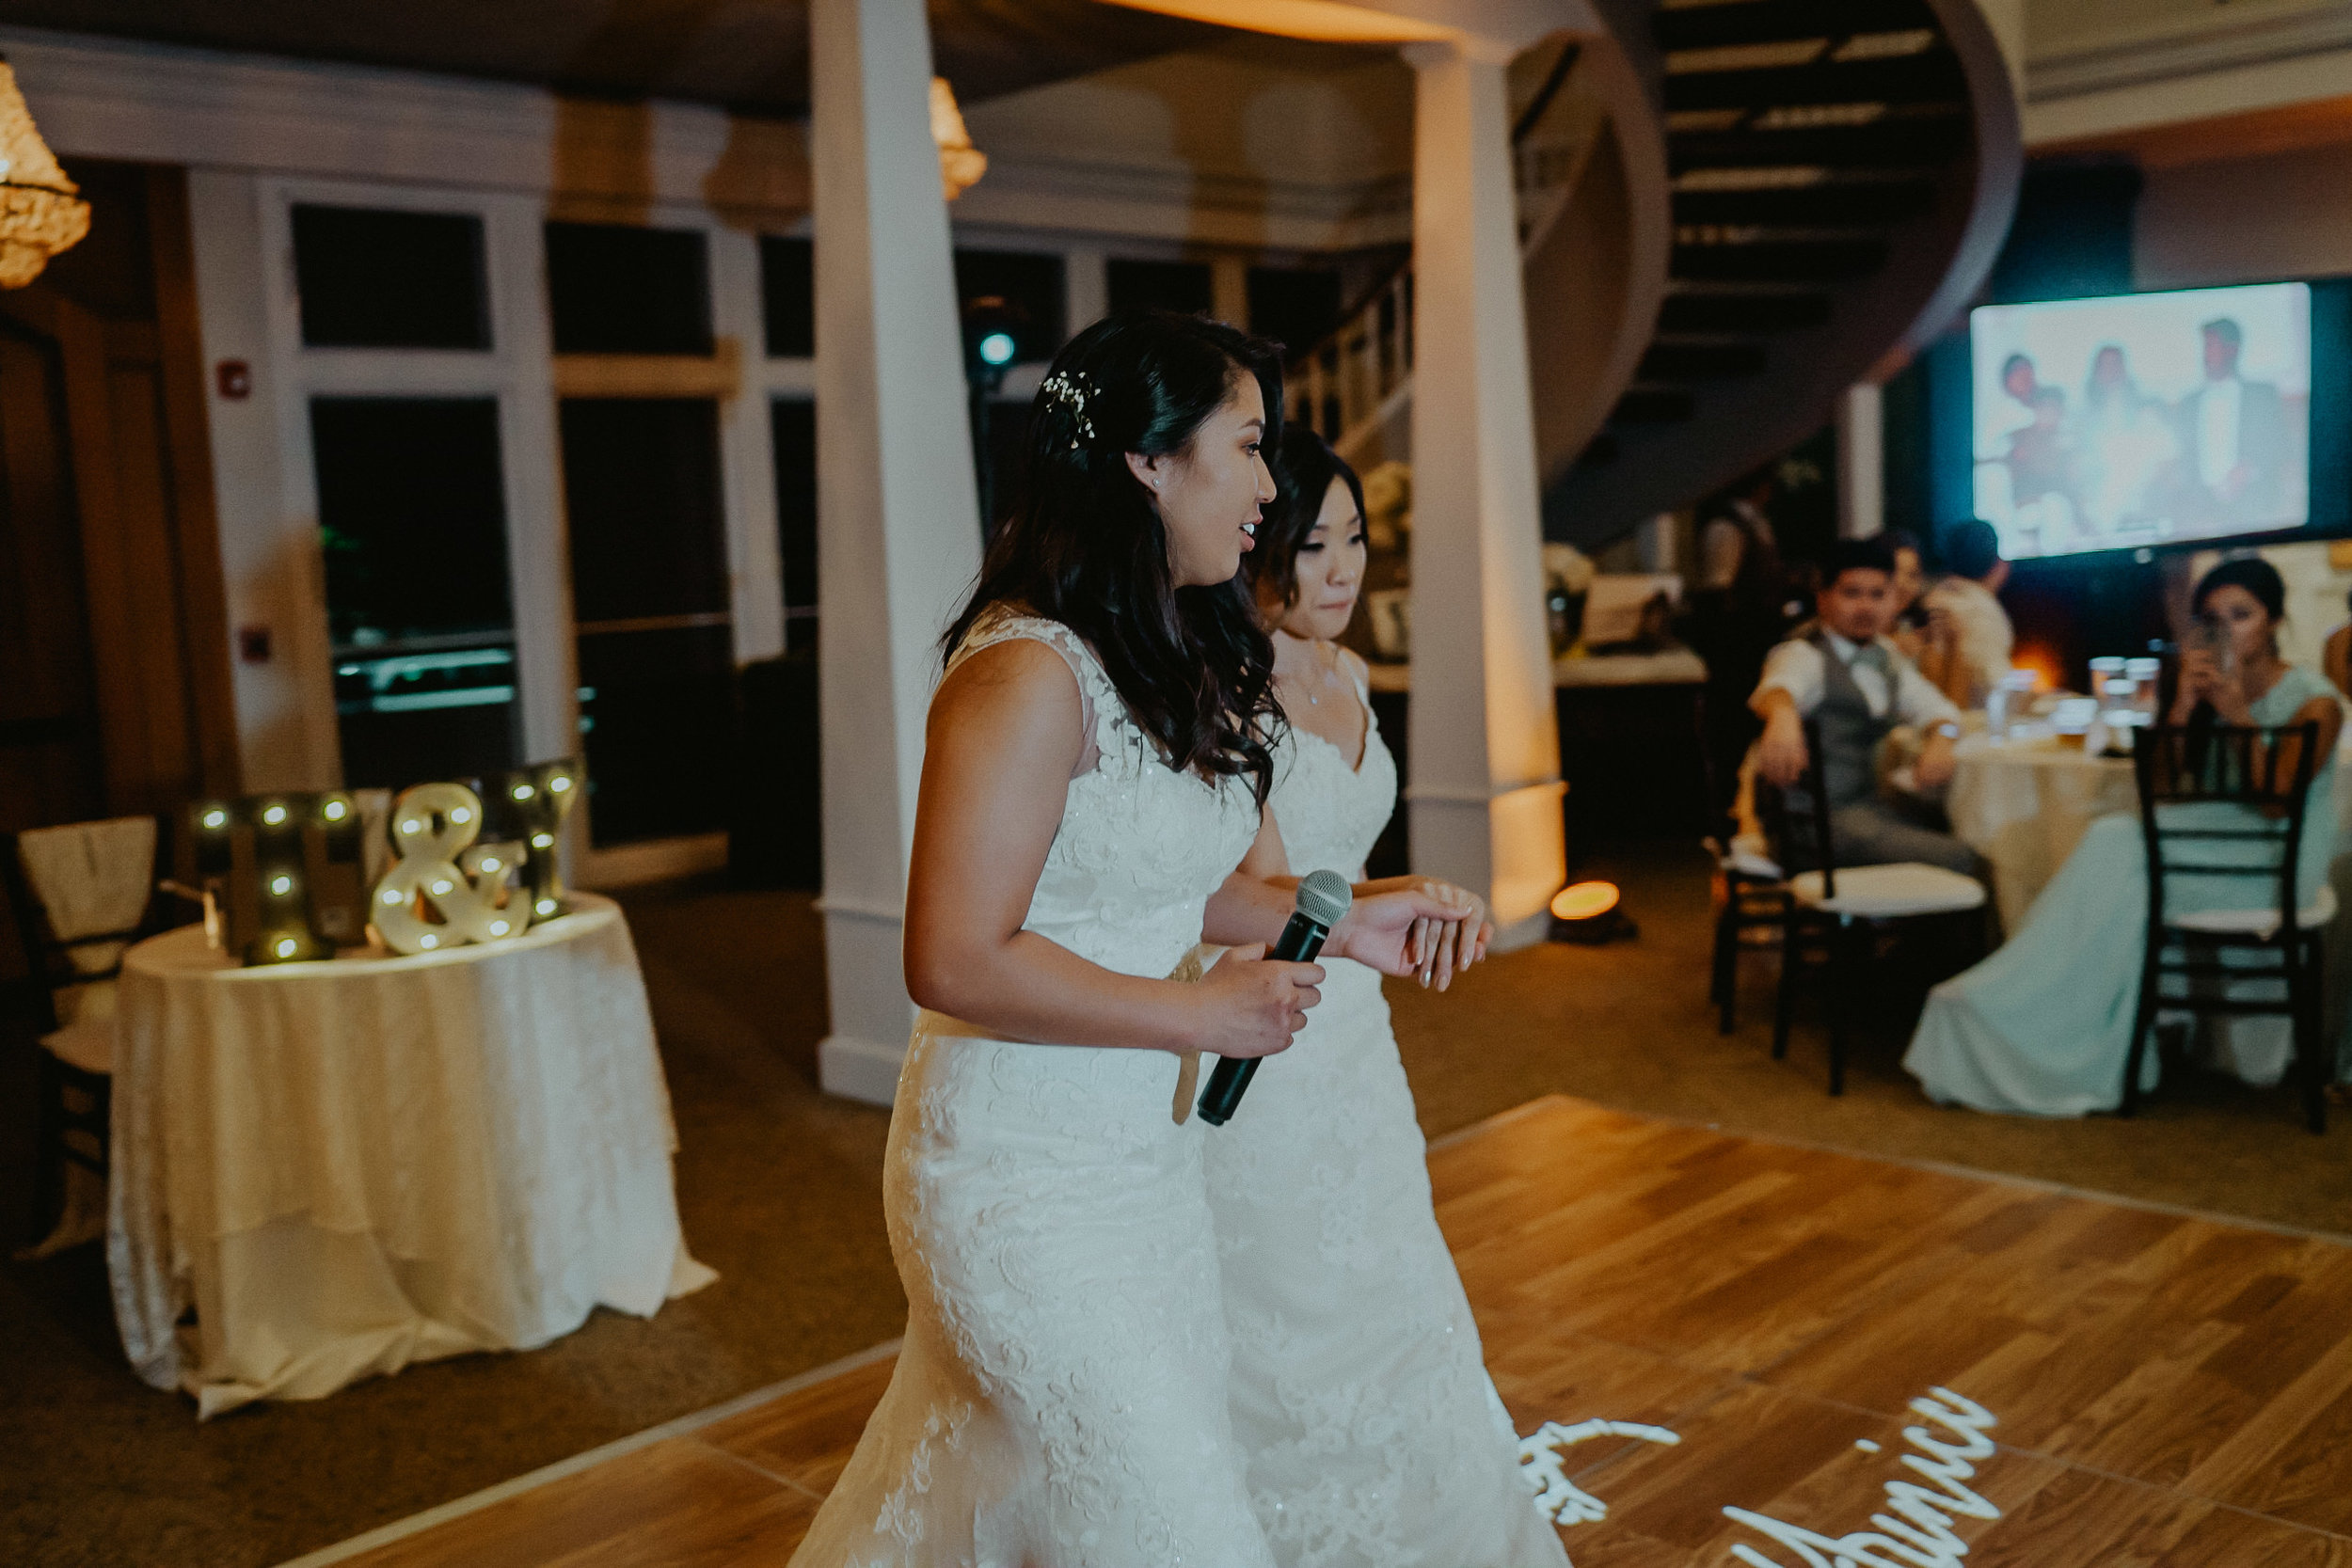 Maui_Destination_wedding_Alfred_Tang-67.jpg